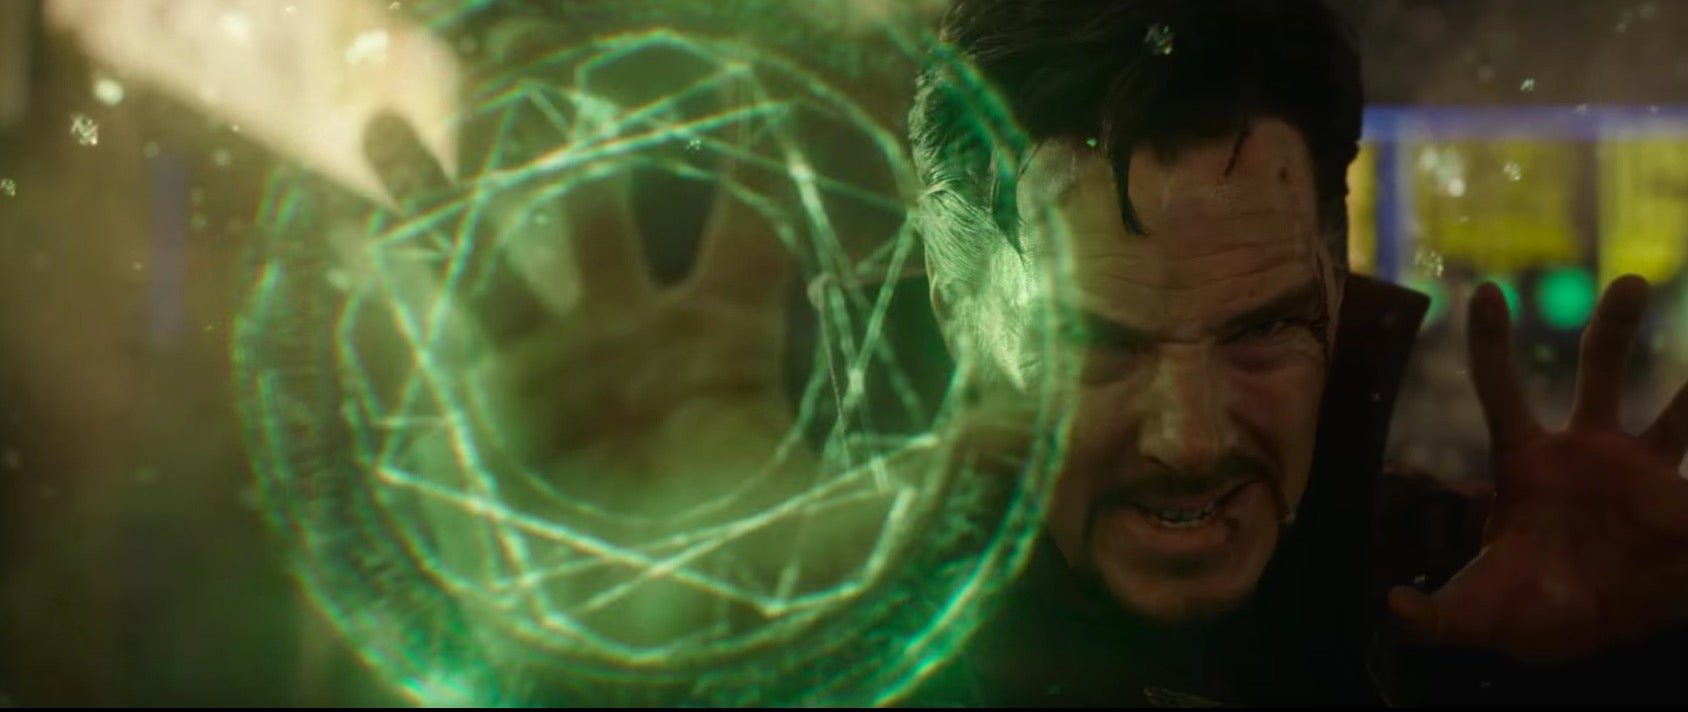 benedict-cumberbatch comic-con doctor-strange io9 marvel marvel-cinematic-universe movies san-diego-comic-con san-diego-comic-con-2016 sdcc-2016